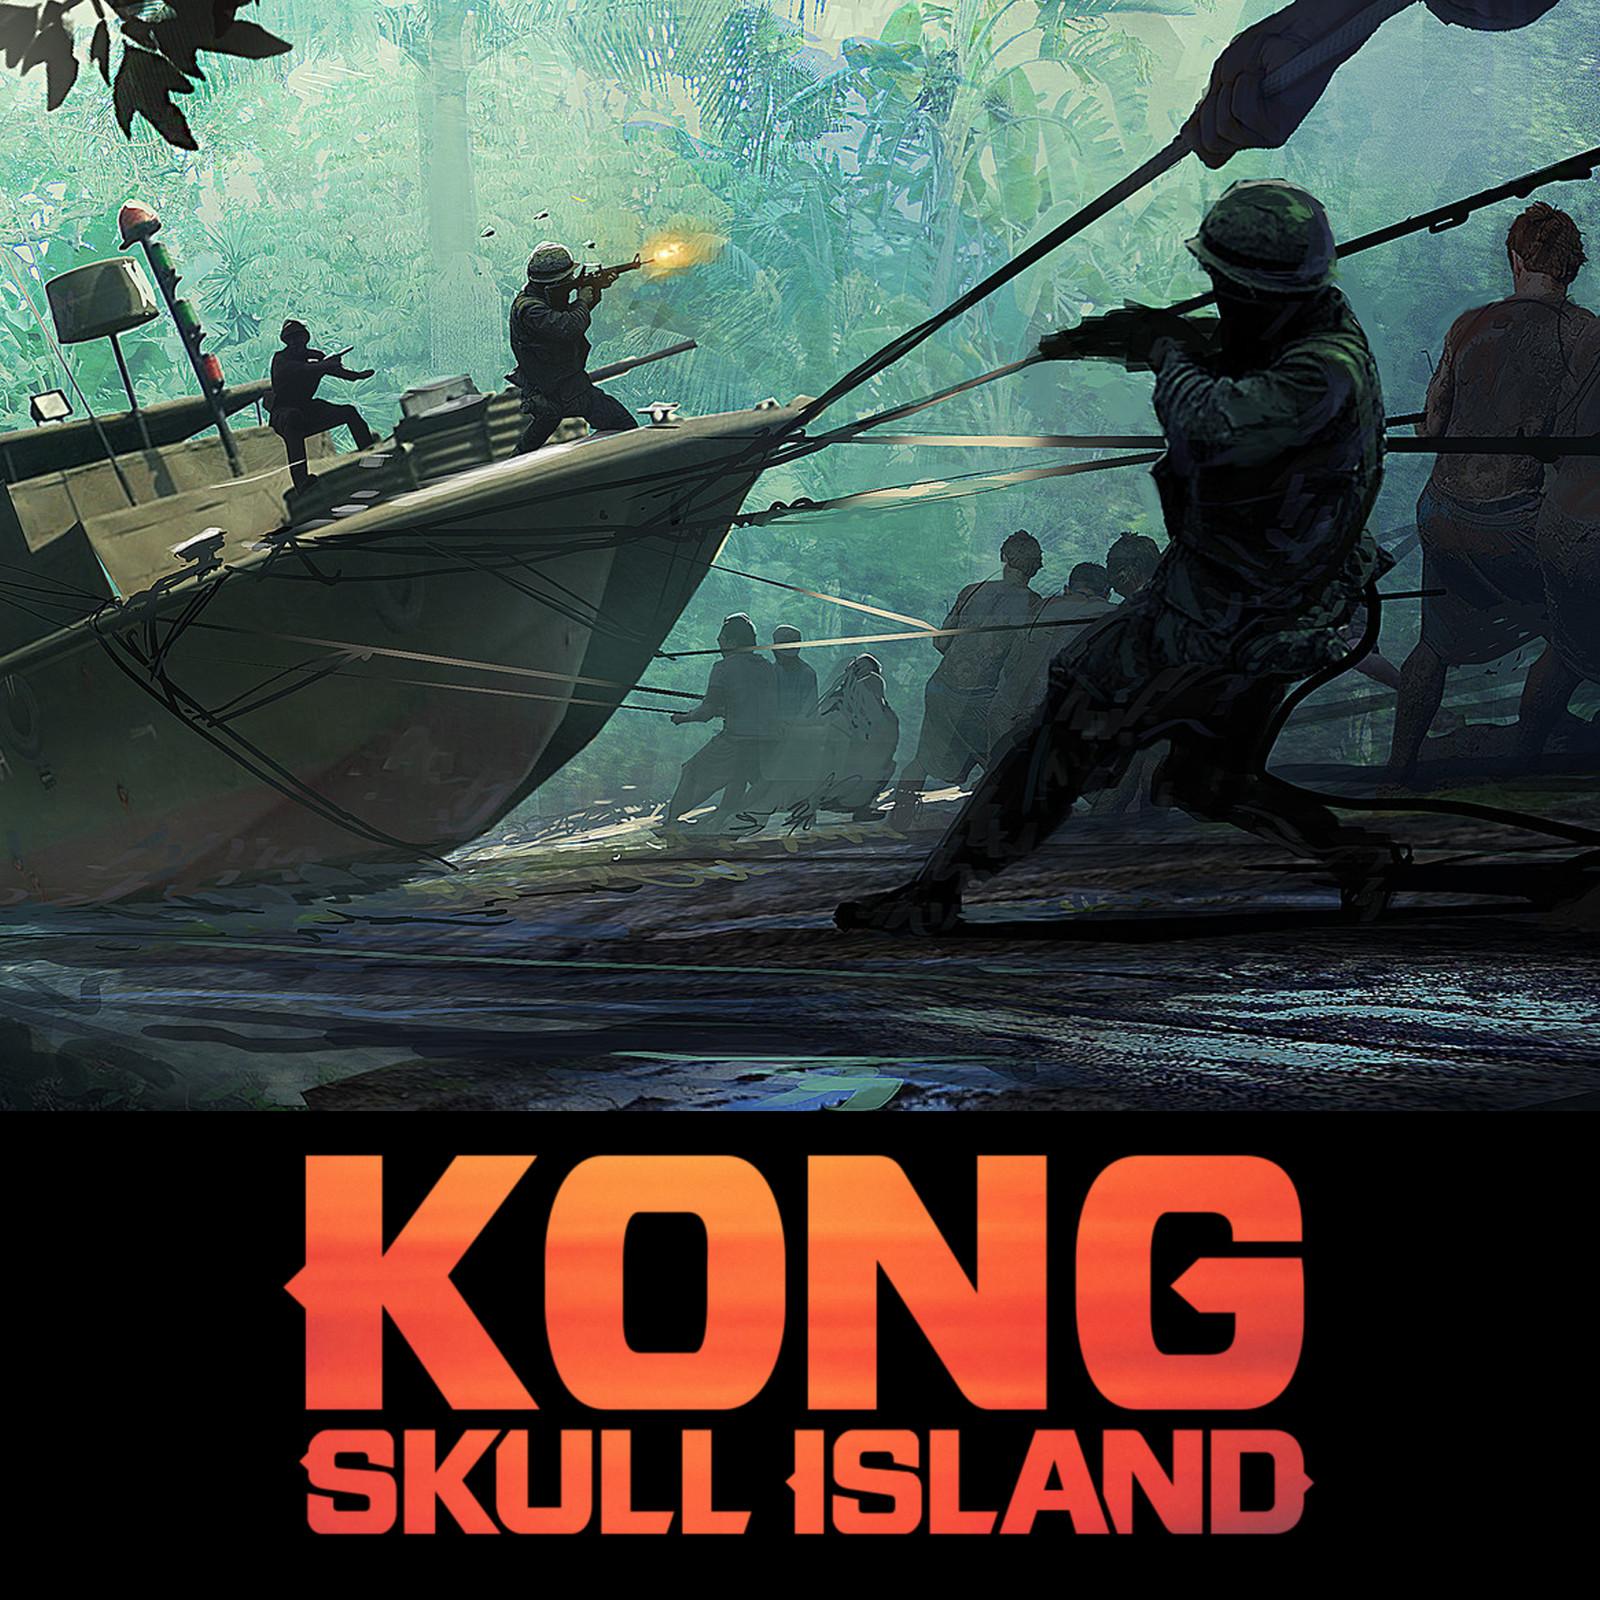 Kong ; Skull Island - river boat haul